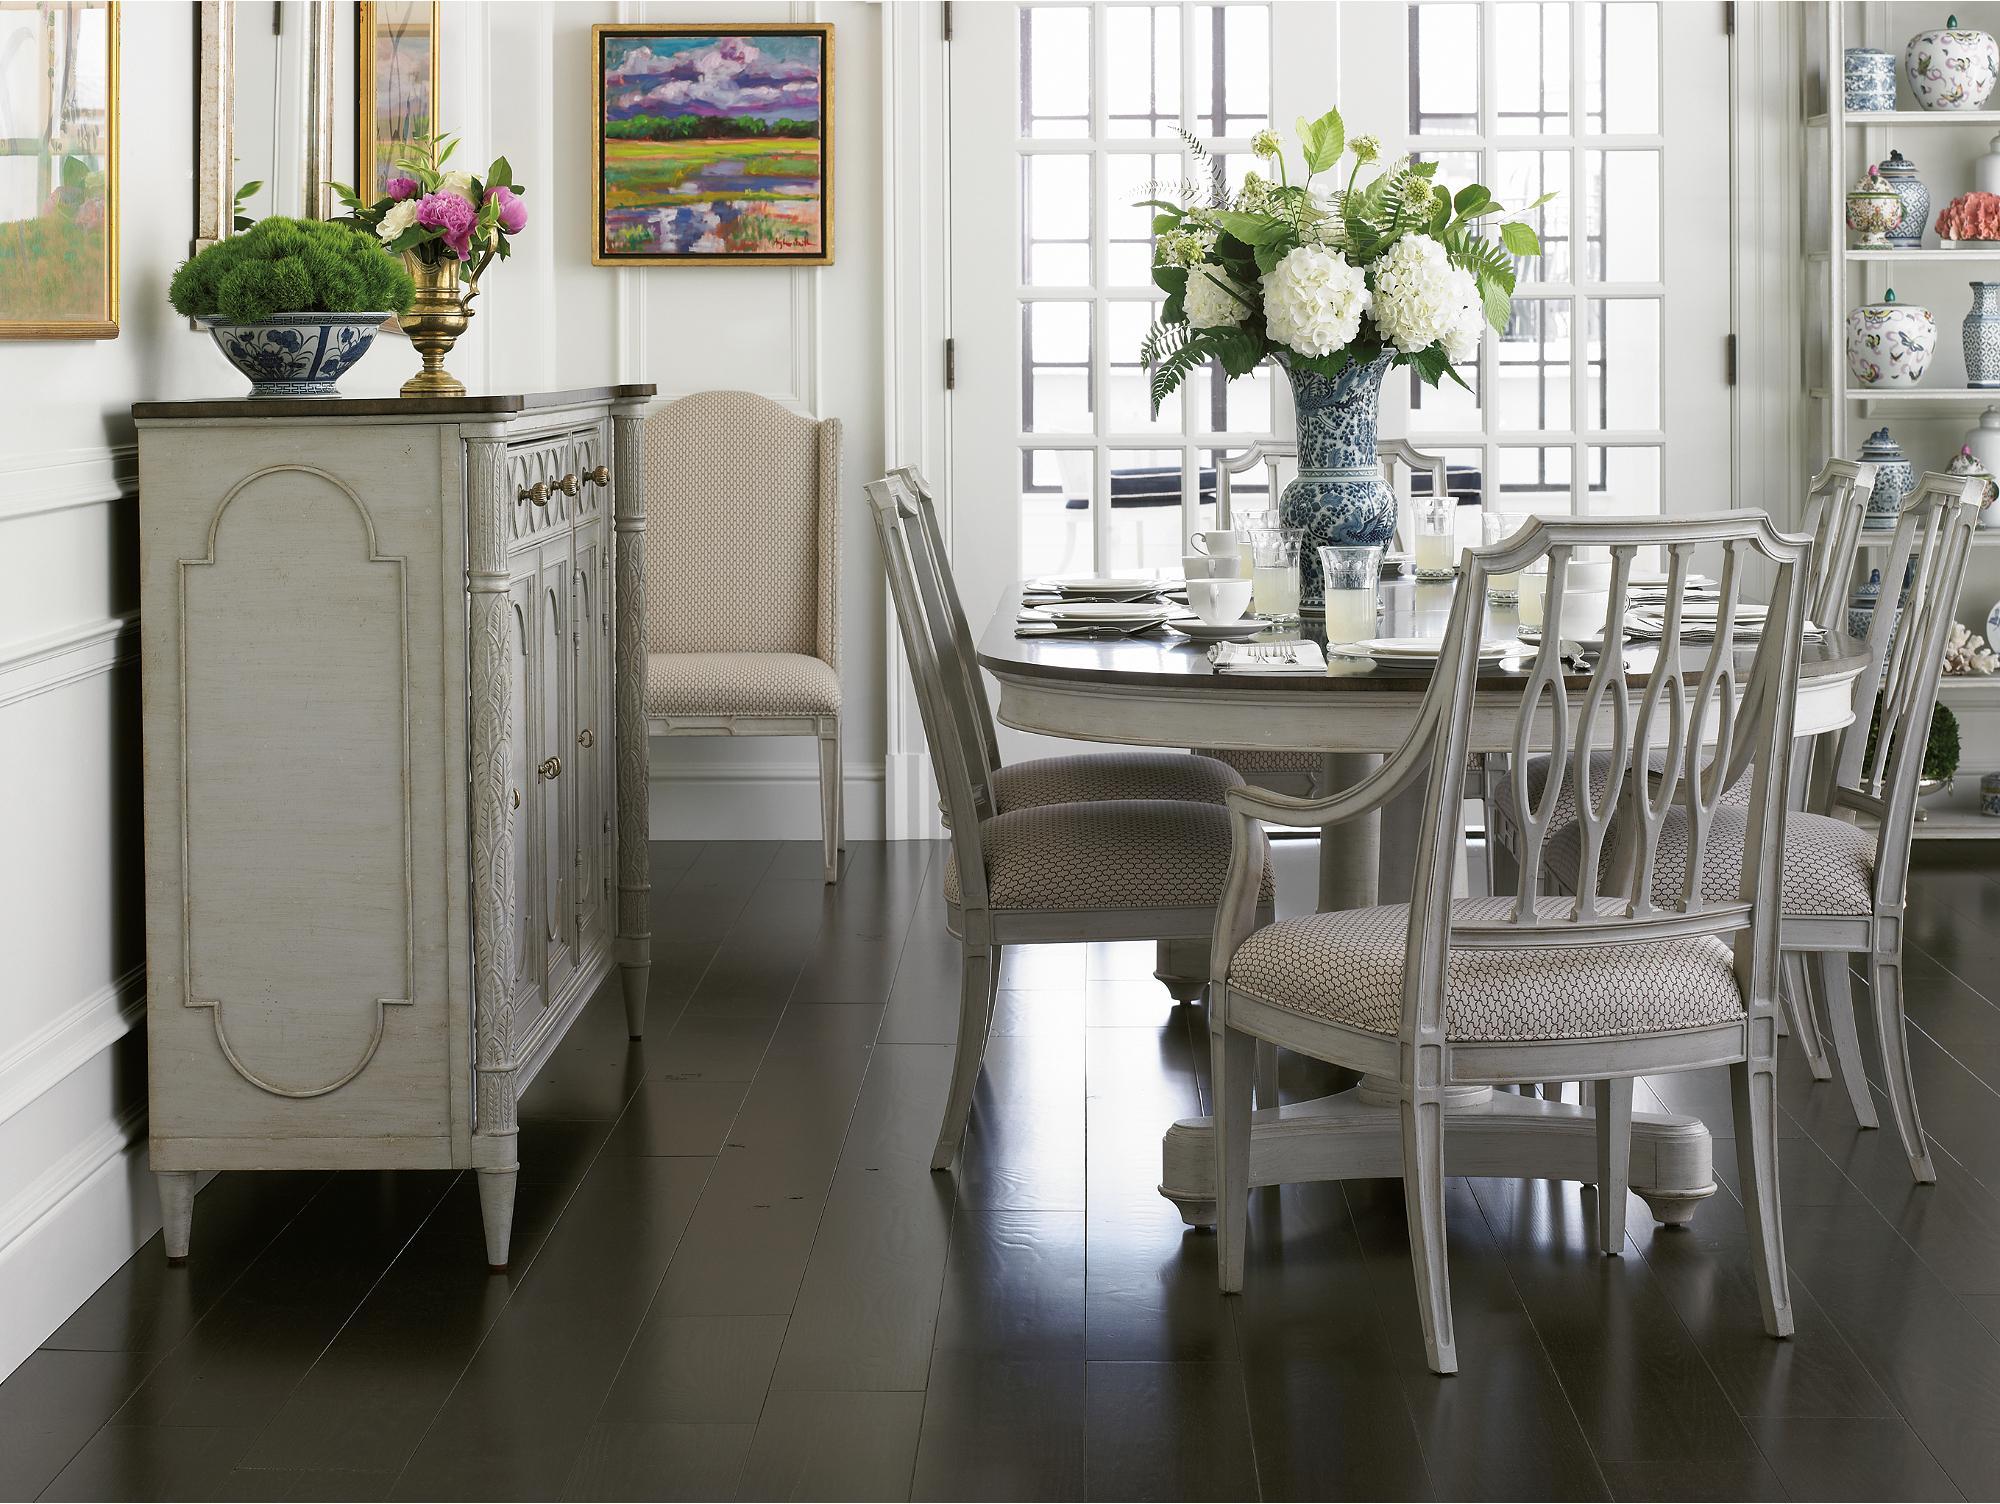 Stanley Furniture Charleston Regency Formal Dining Room Group - Item Number: 302-5 Dining Room Group 1